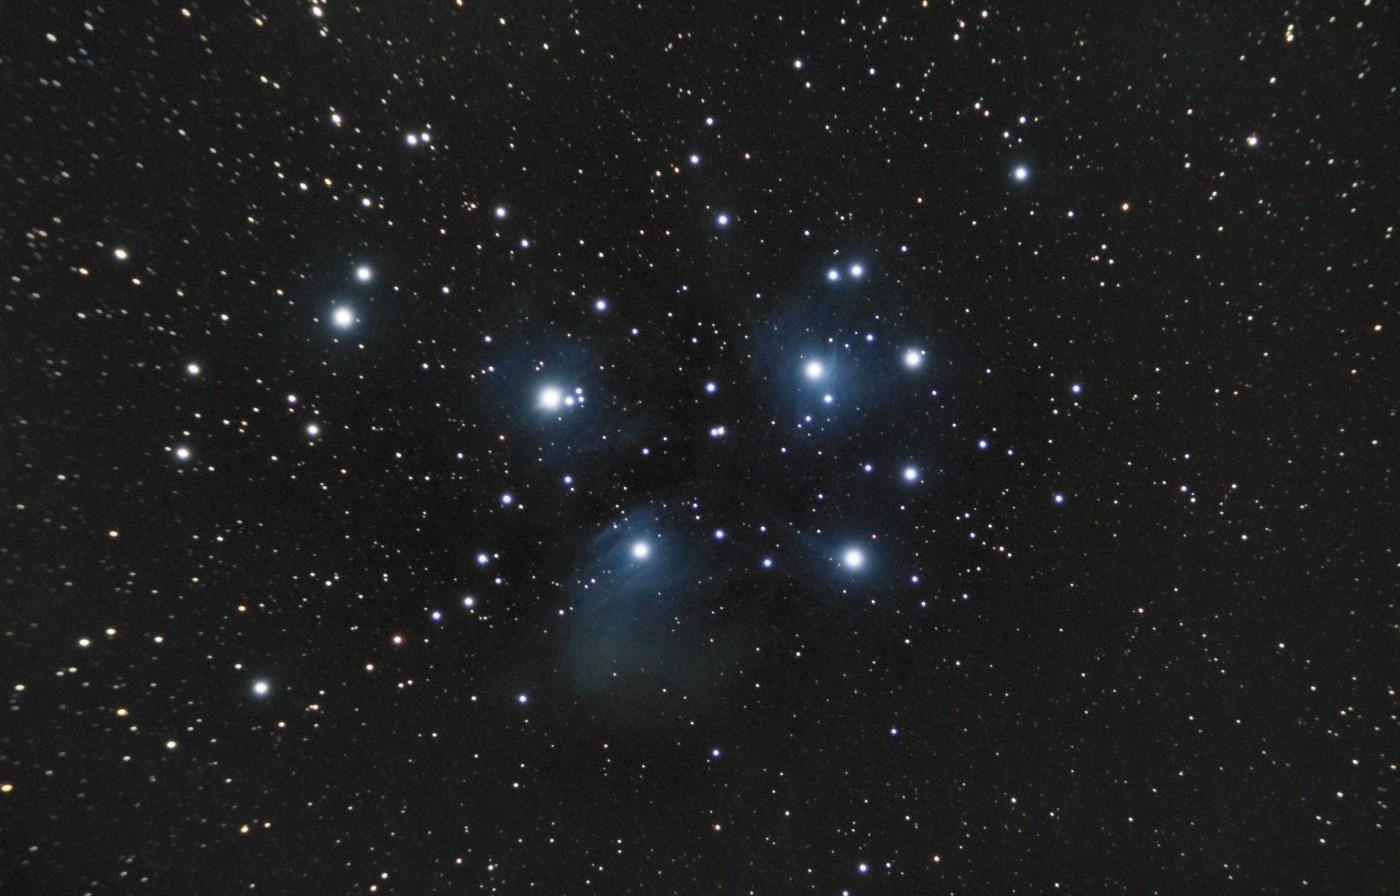 Sept soeurs M45_6210